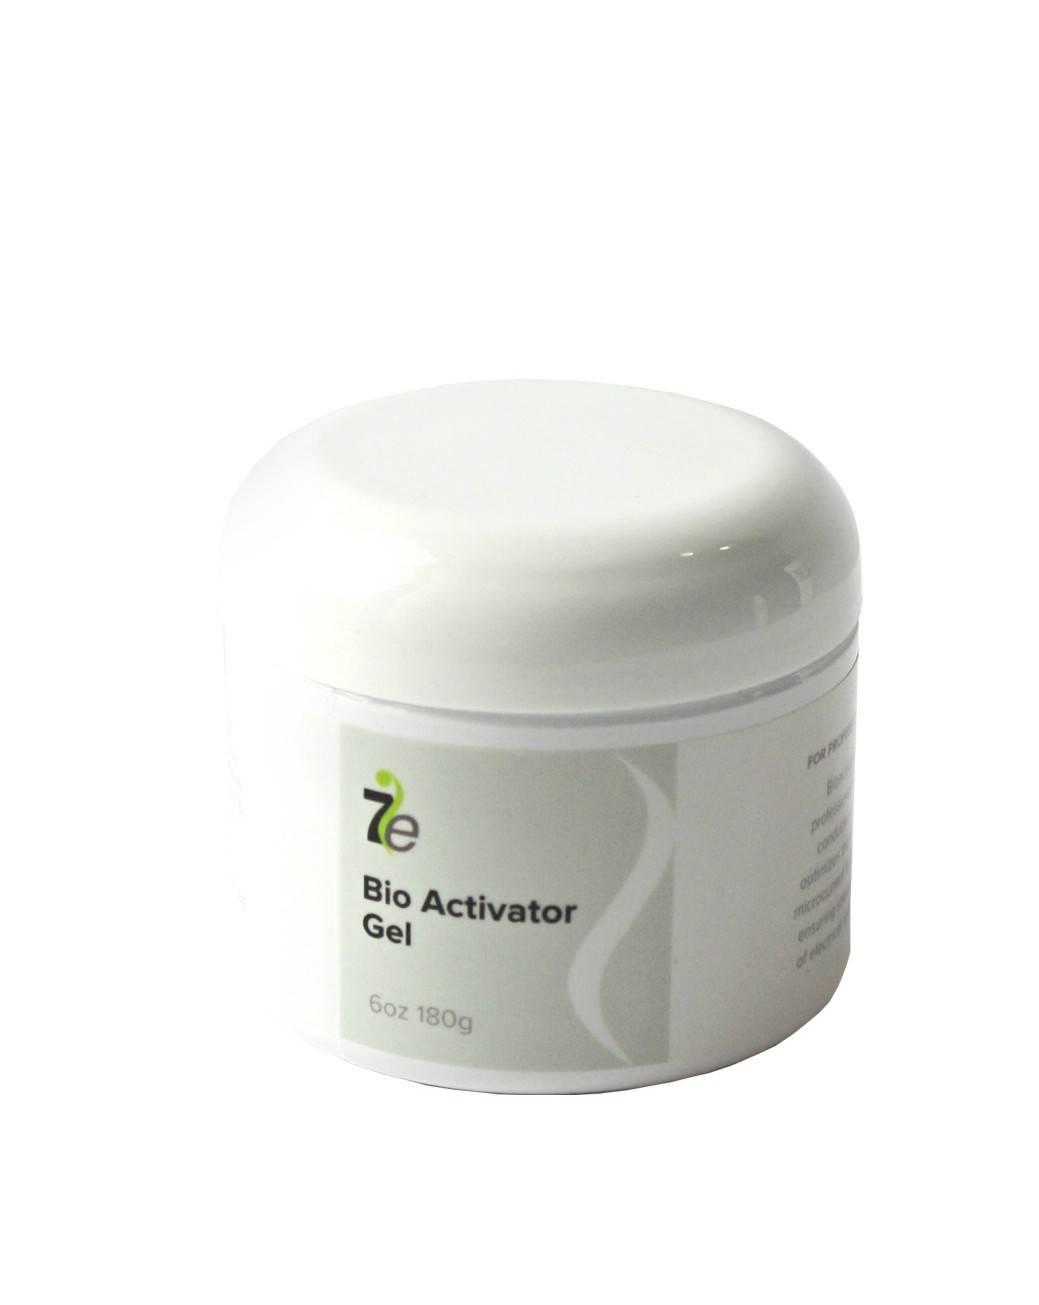 bio-activator gel